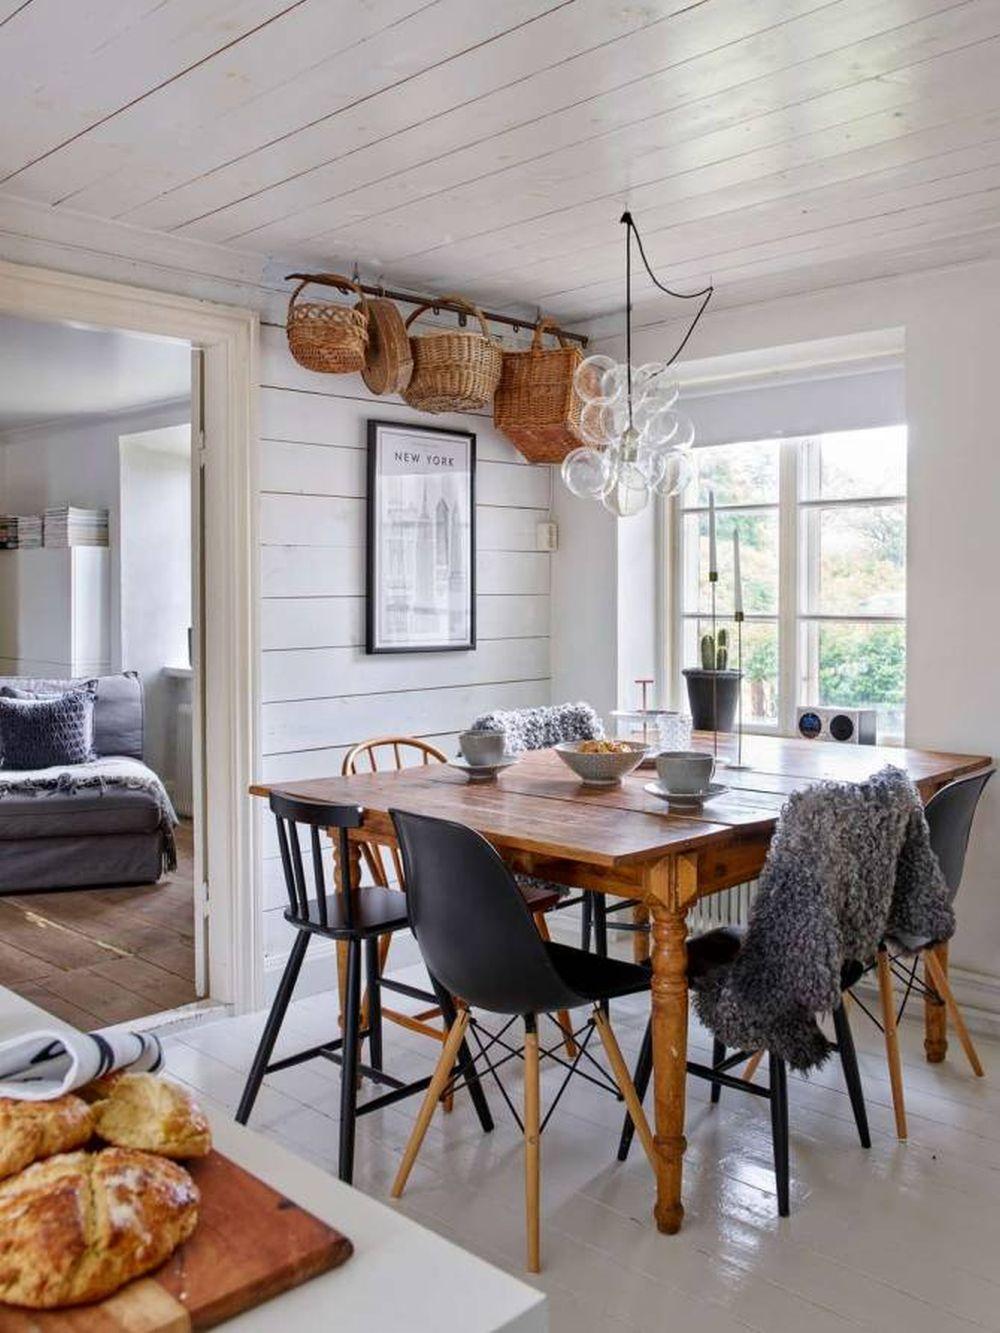 adelaparvu.com despre casa cu sarm rustic, Suedia, Foto Jonas Lundberg (2)